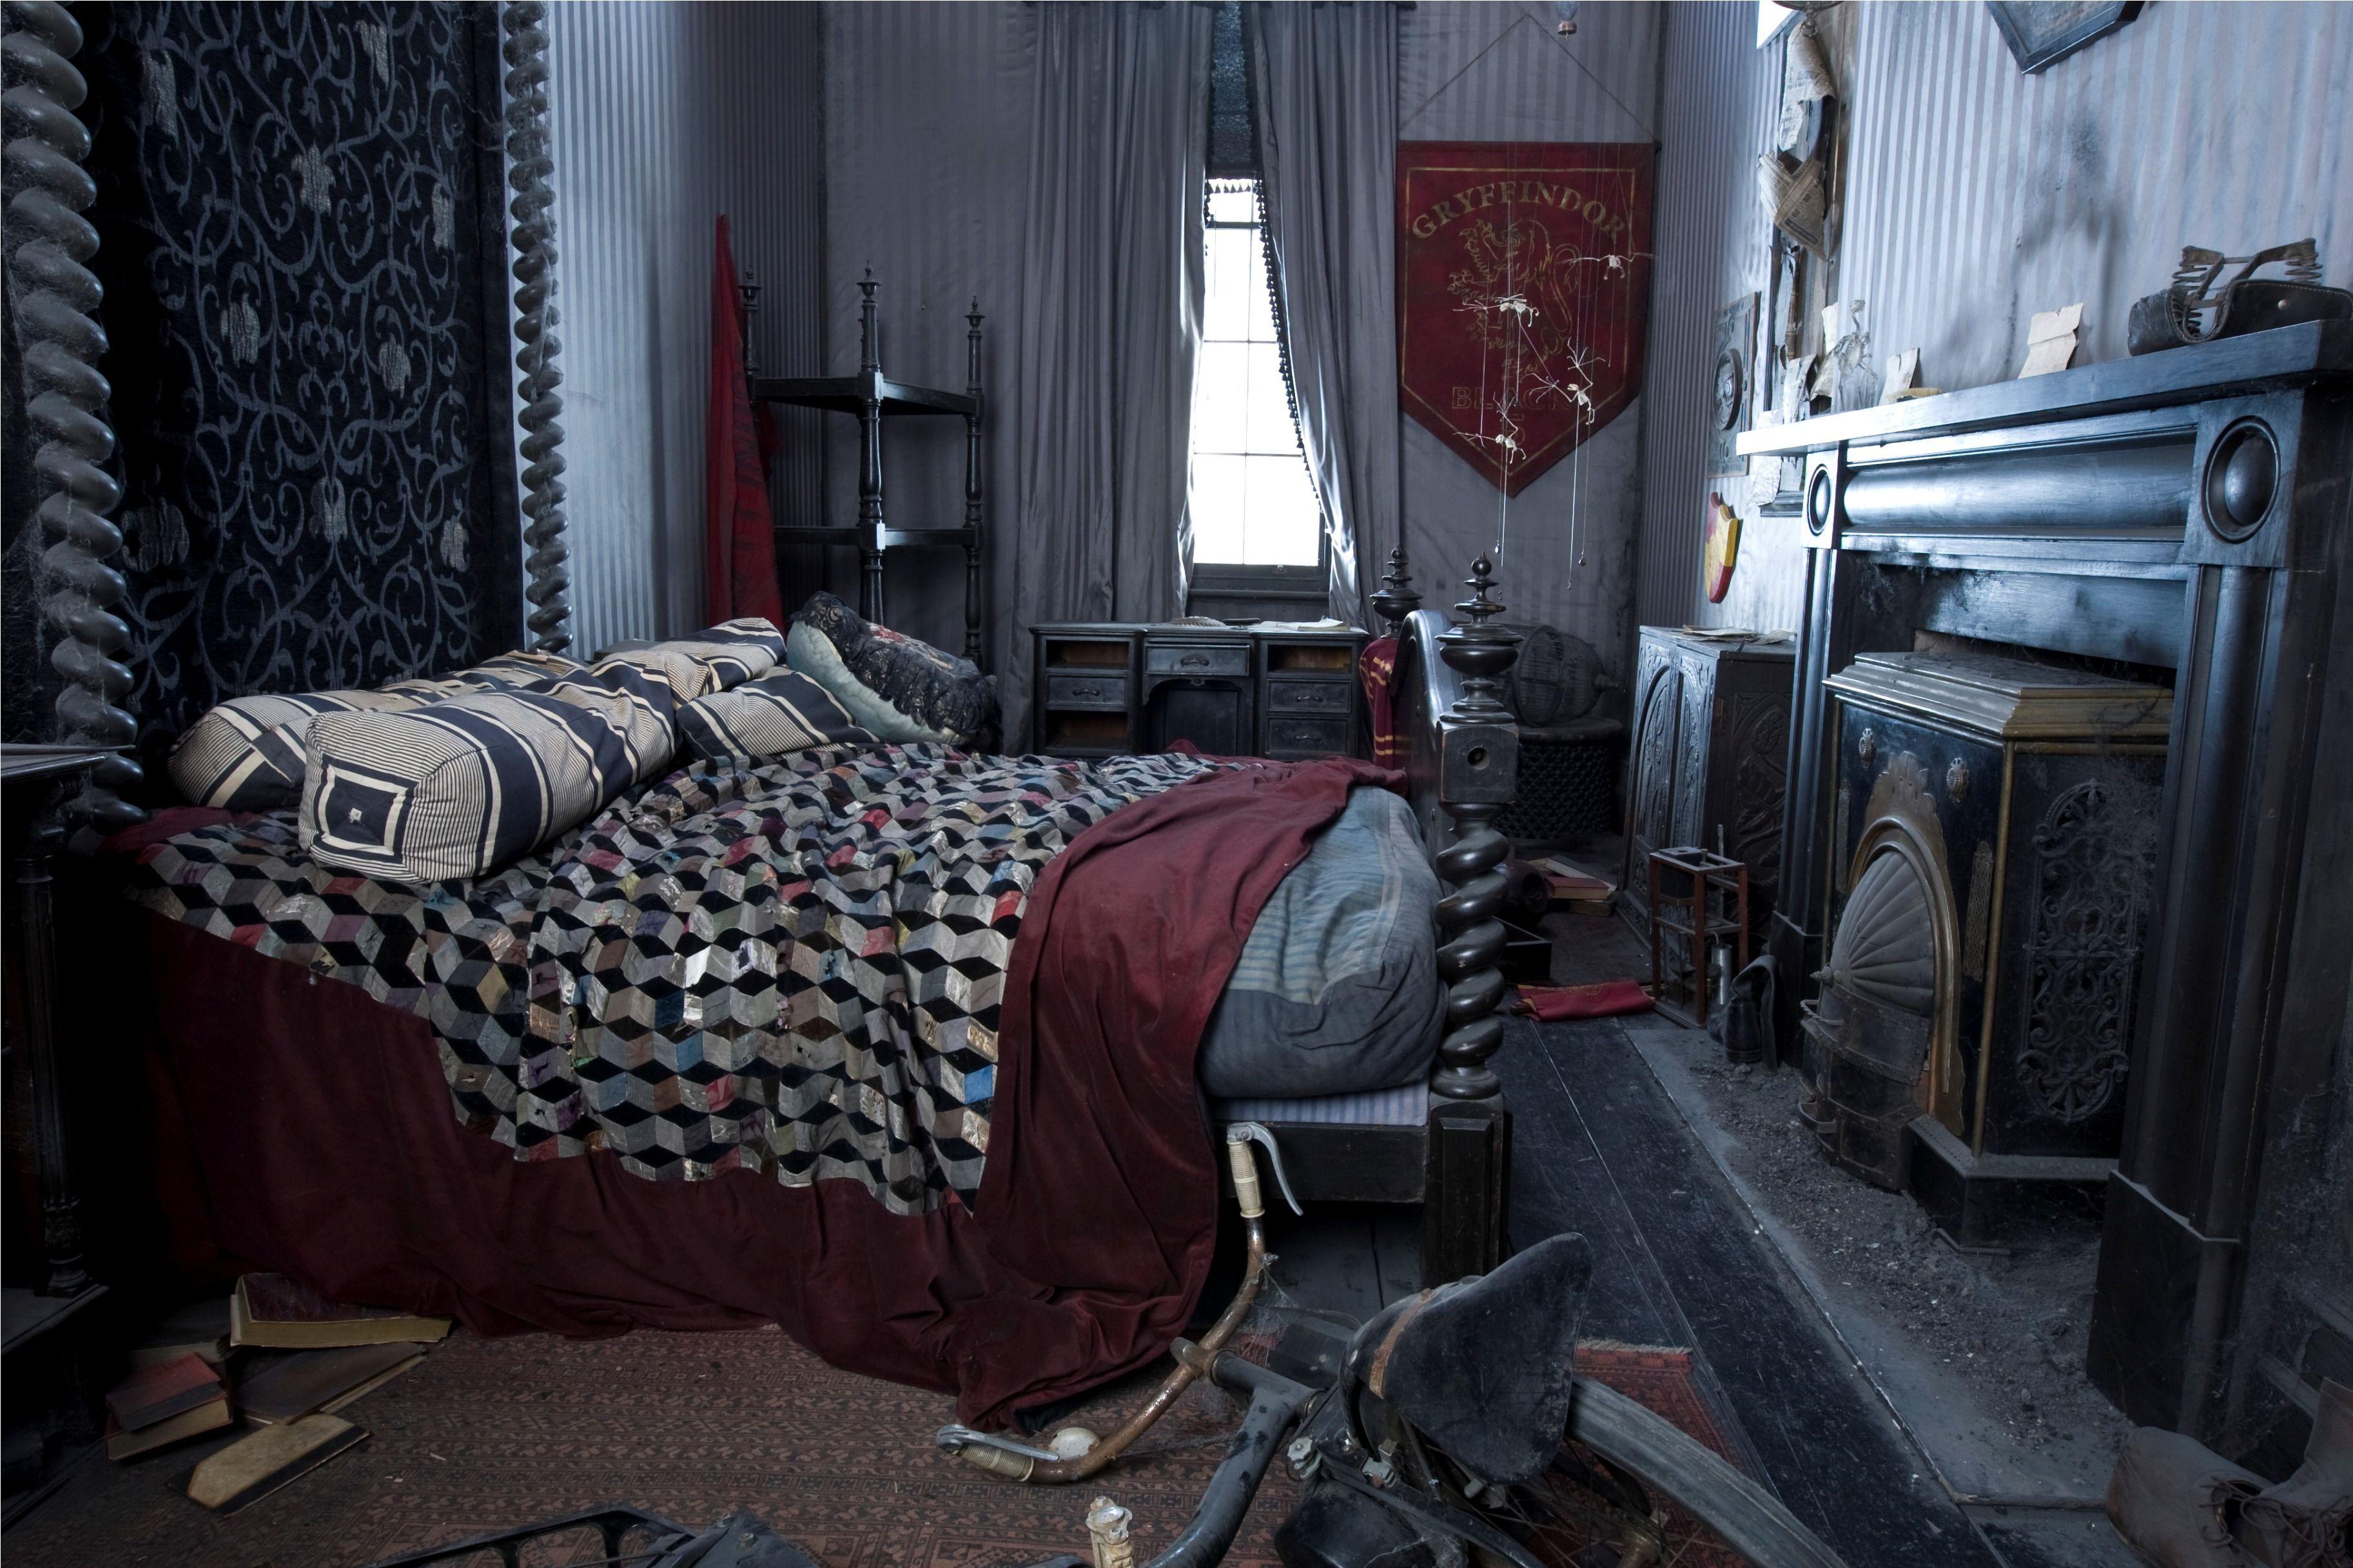 Sirius Black 39 S Bedroom Harry Potter Wiki Fandom Powered By Wikia Harry Potter Bedroom Harry Potter Room Black Rooms